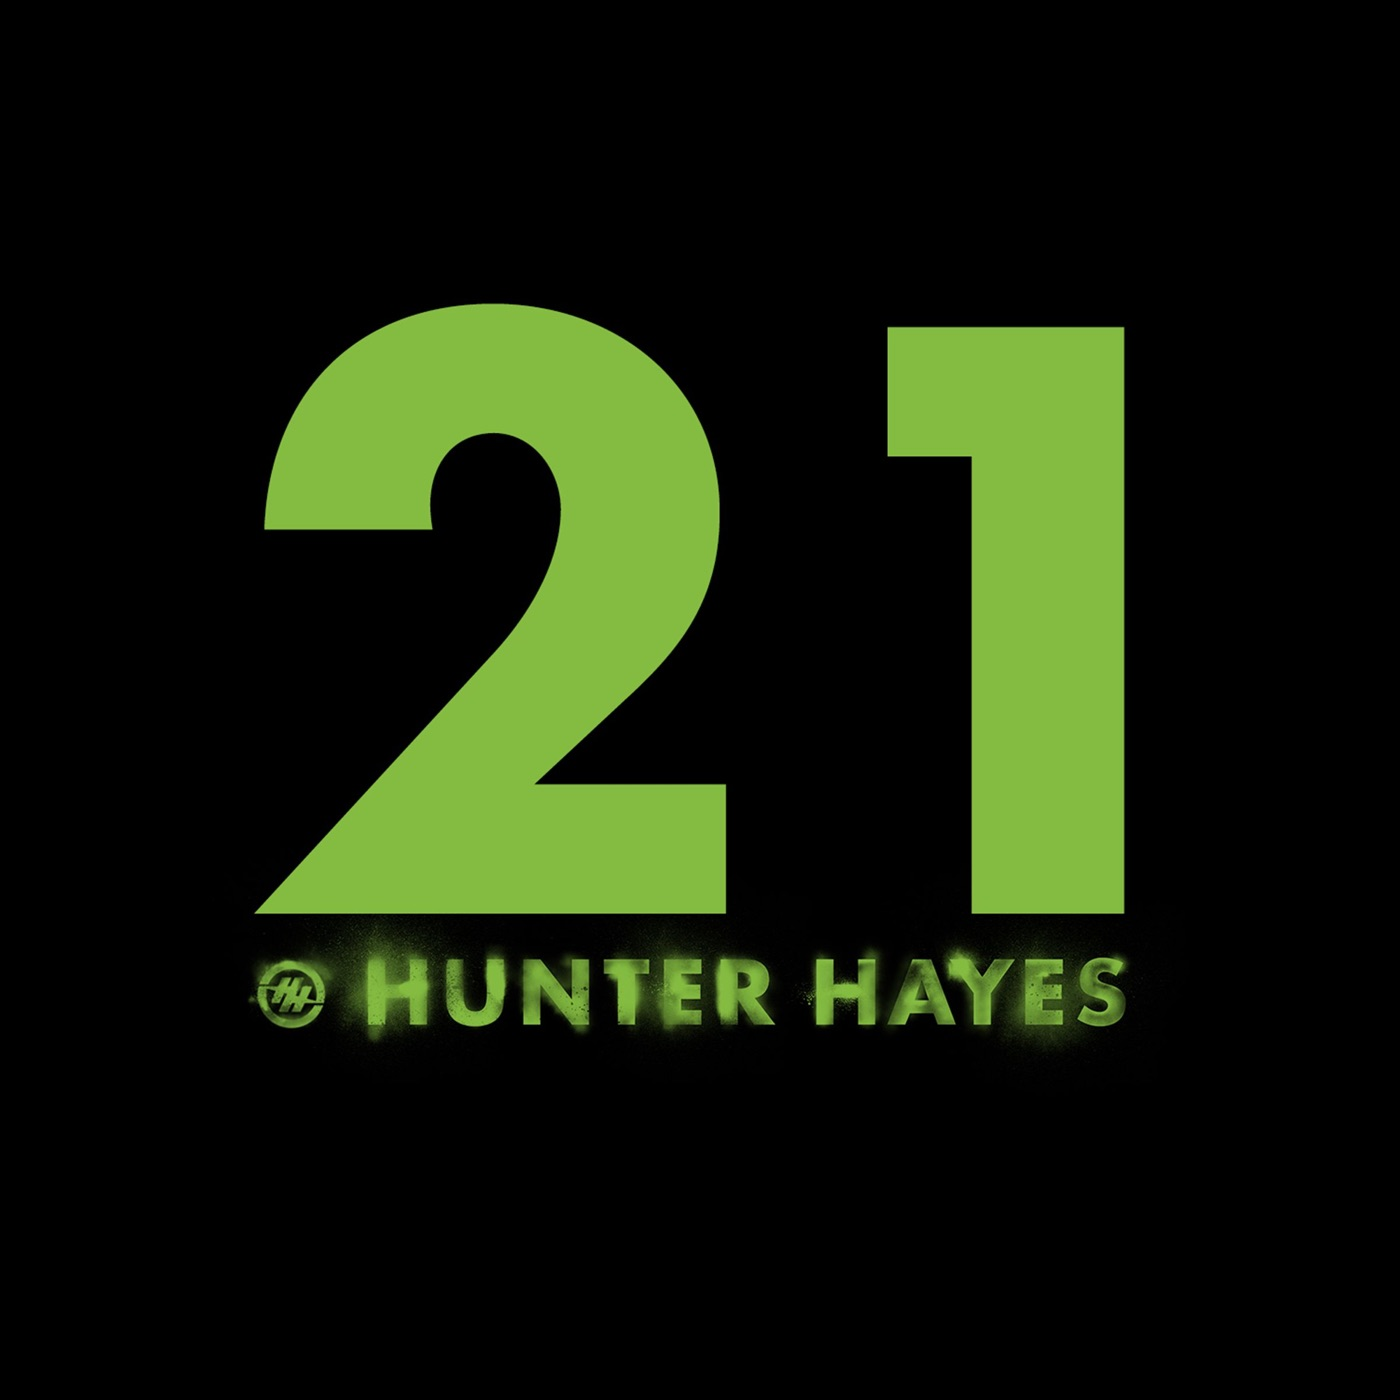 Hunter Hayes - 21 - Single